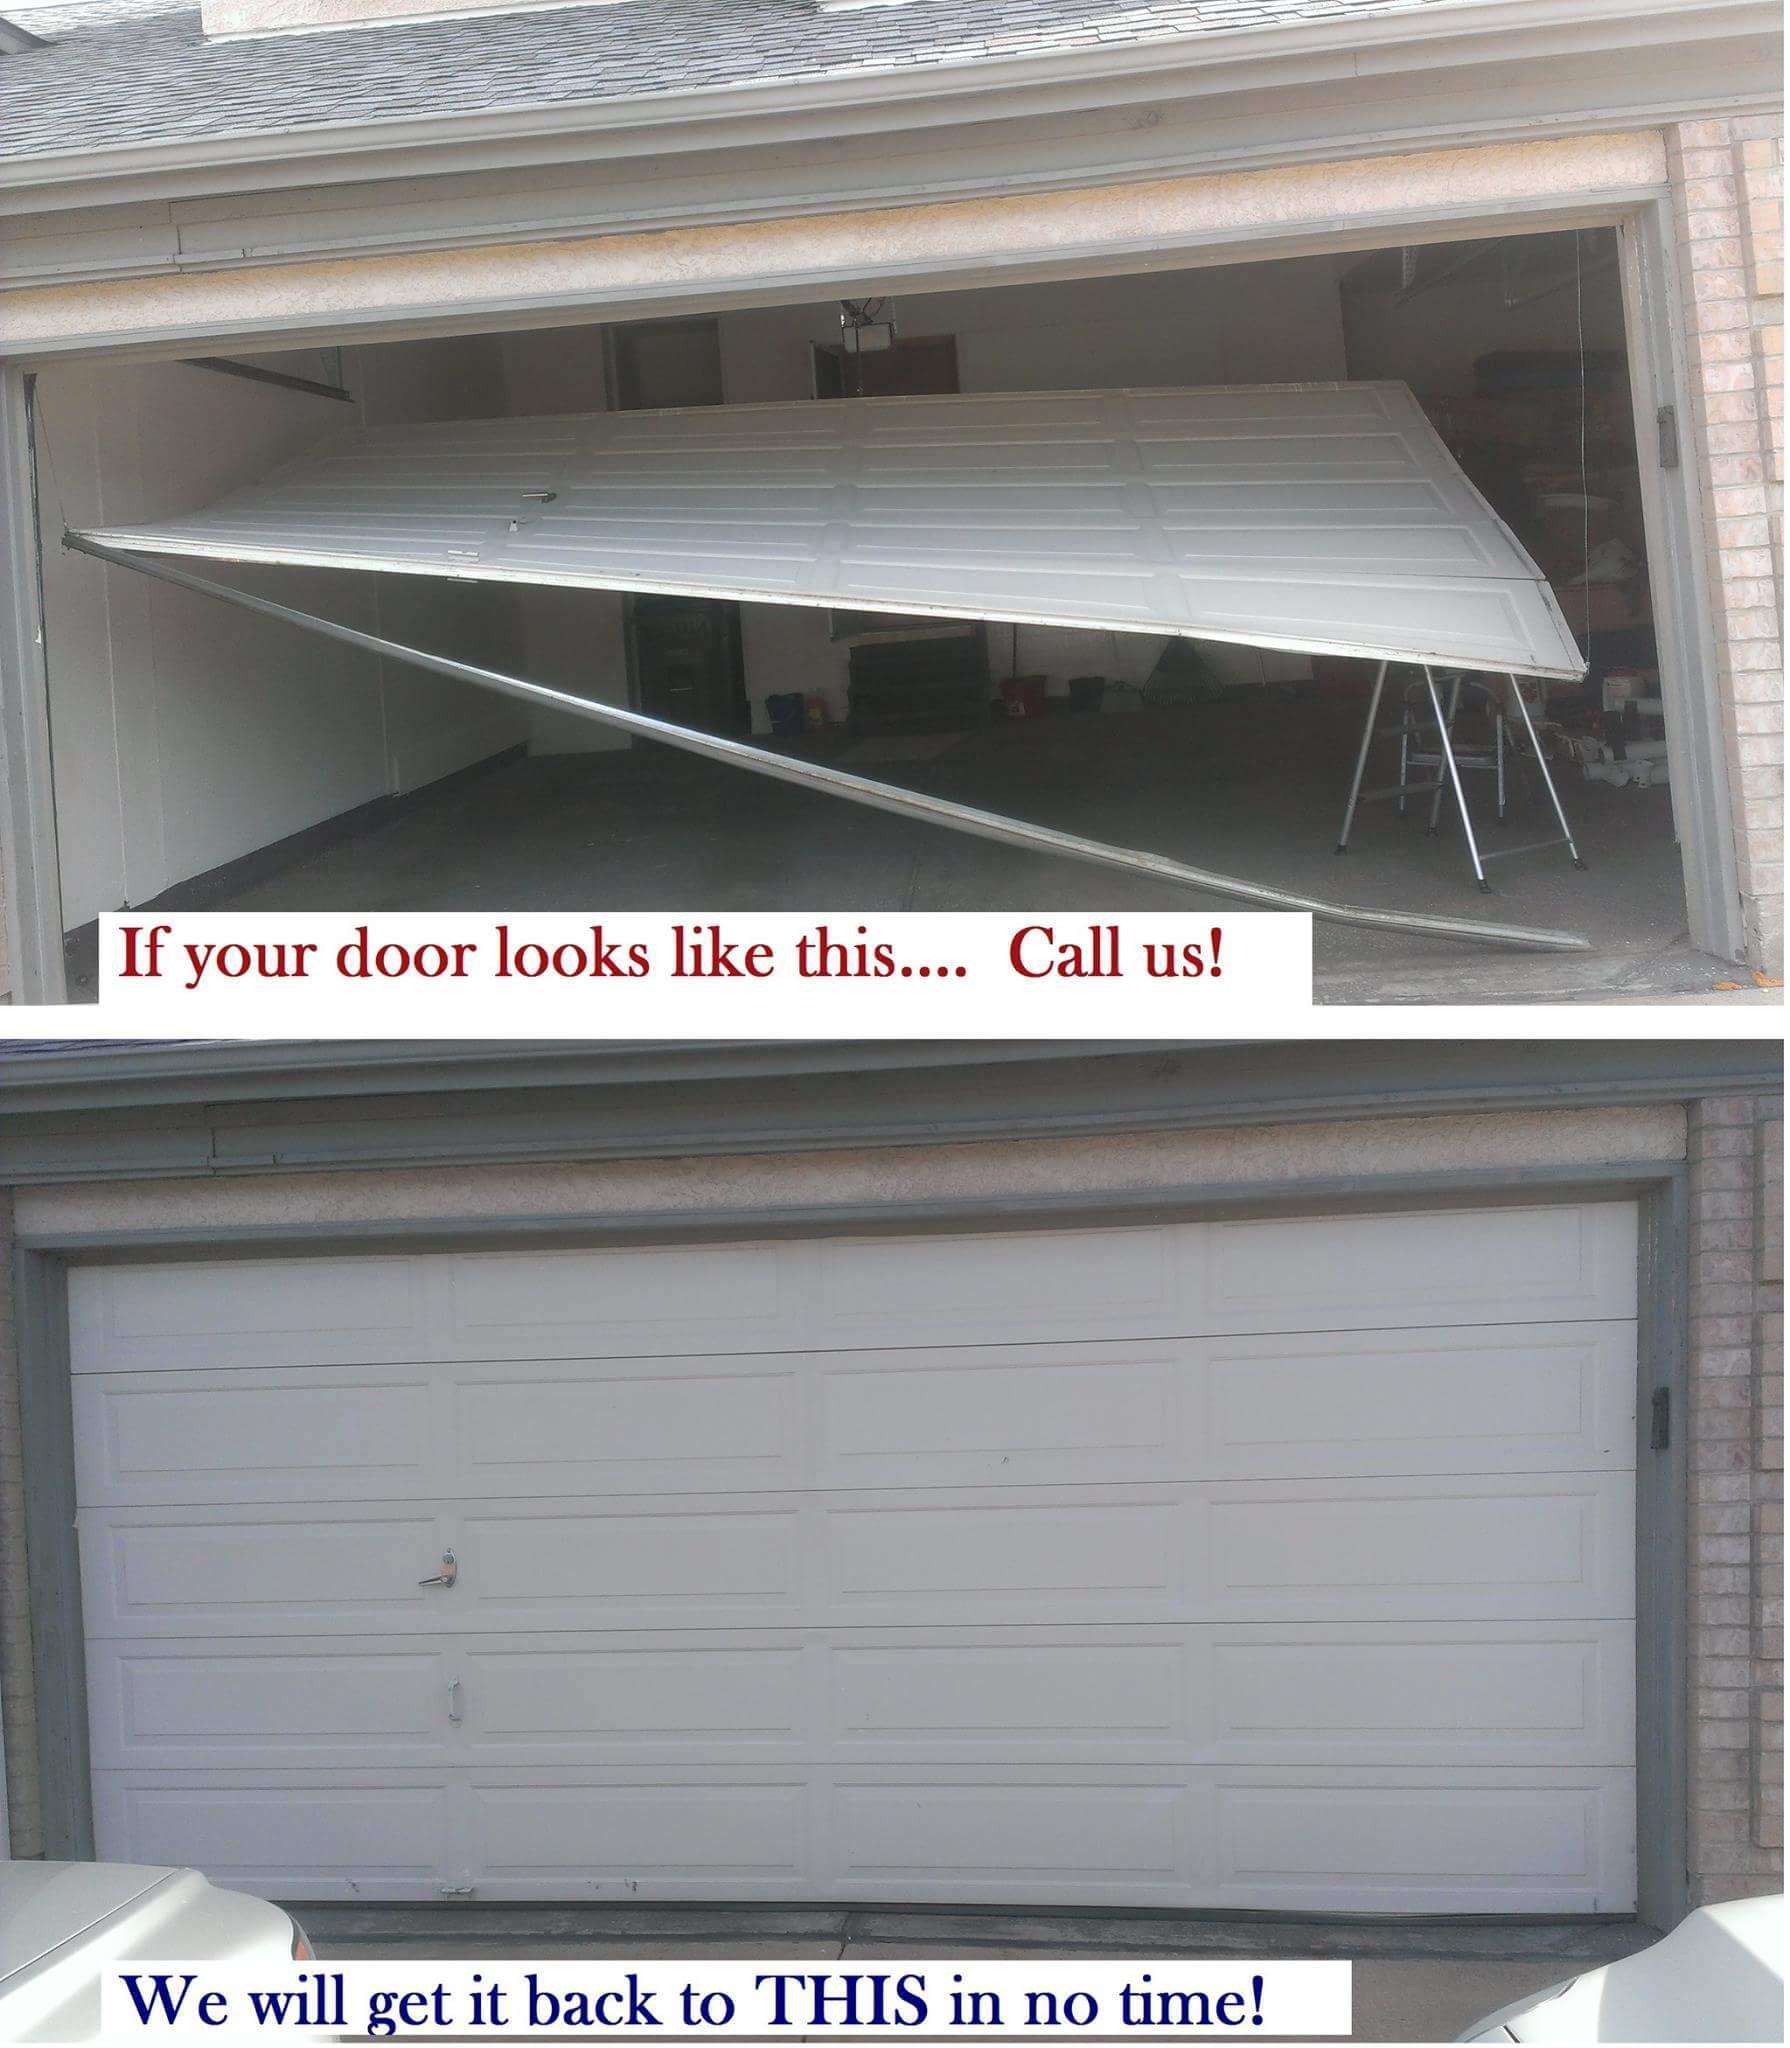 2048 #785F53 Allied Services Garage Door And Gate Repair In Houston TX 77007  wallpaper Wayne Dalton Garage Doors Houston 35851790